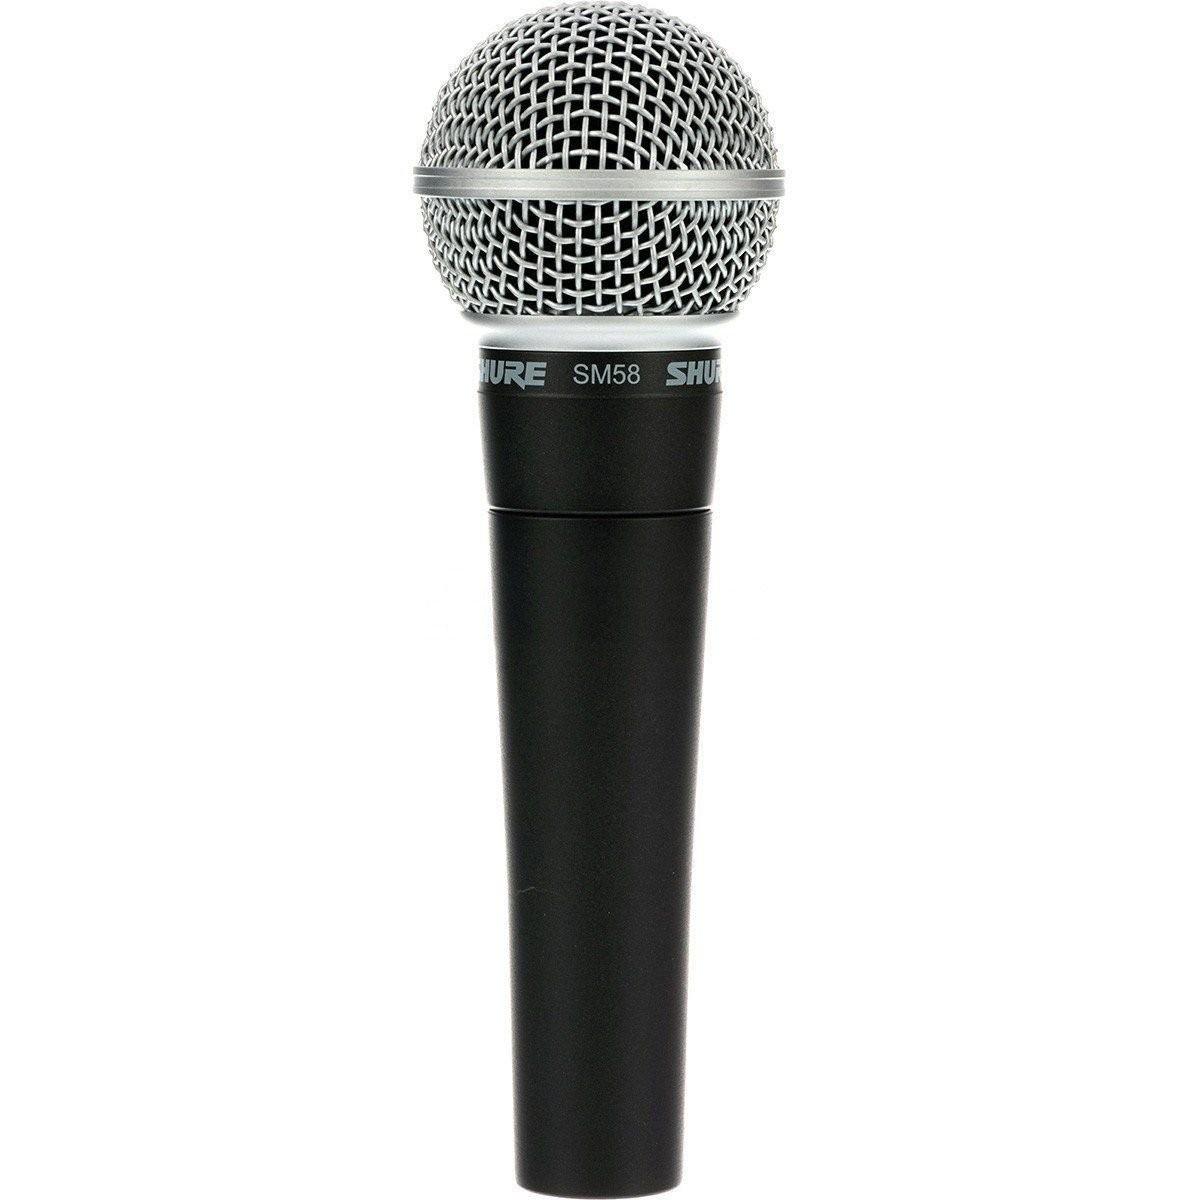 Microfone Vocal SM58 Shure Preto  - Casa do Roadie